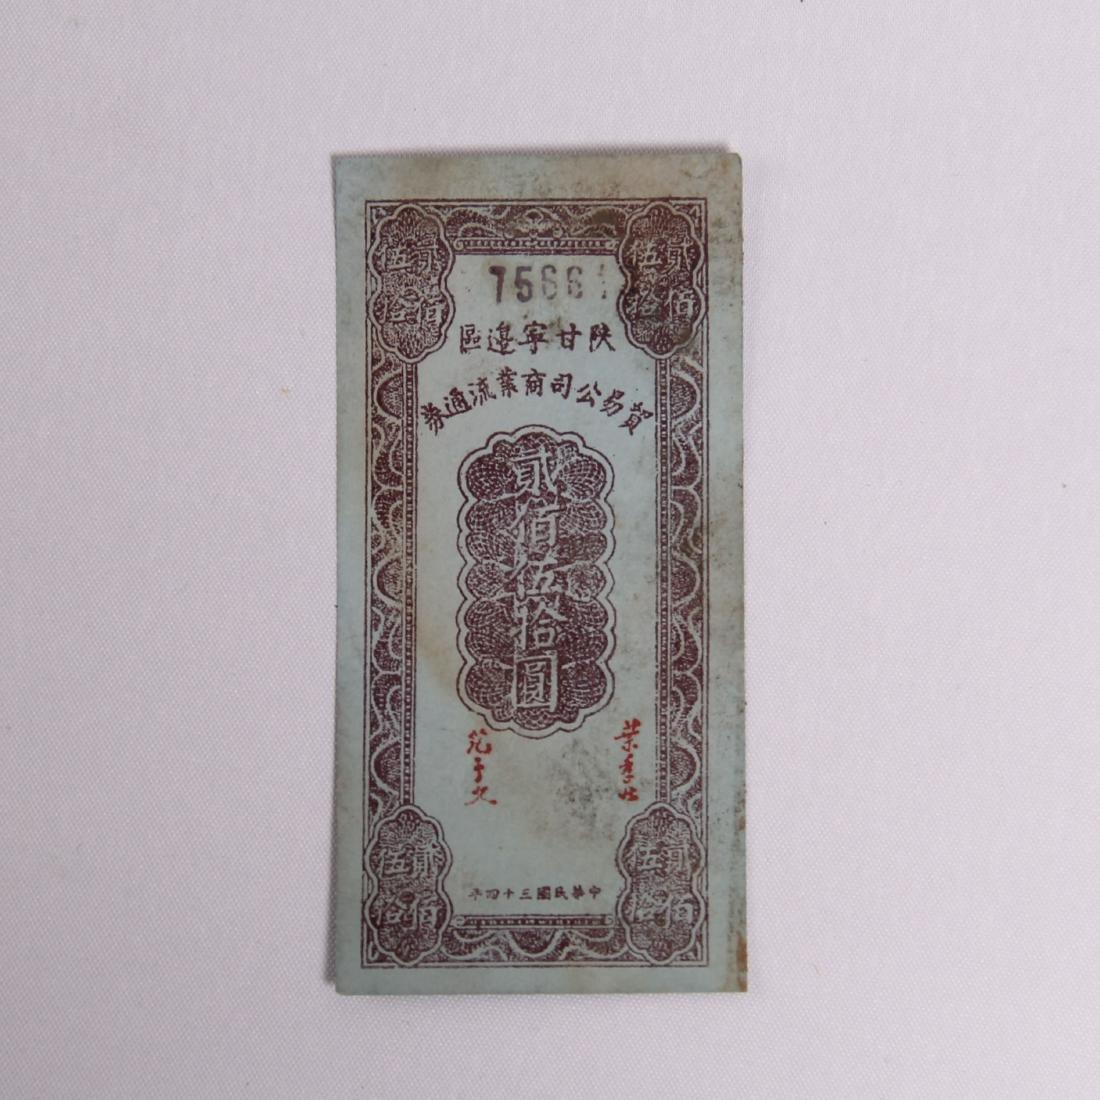 CHINESE SOVIET BANK NOTE 250 DOLLARS 1940S